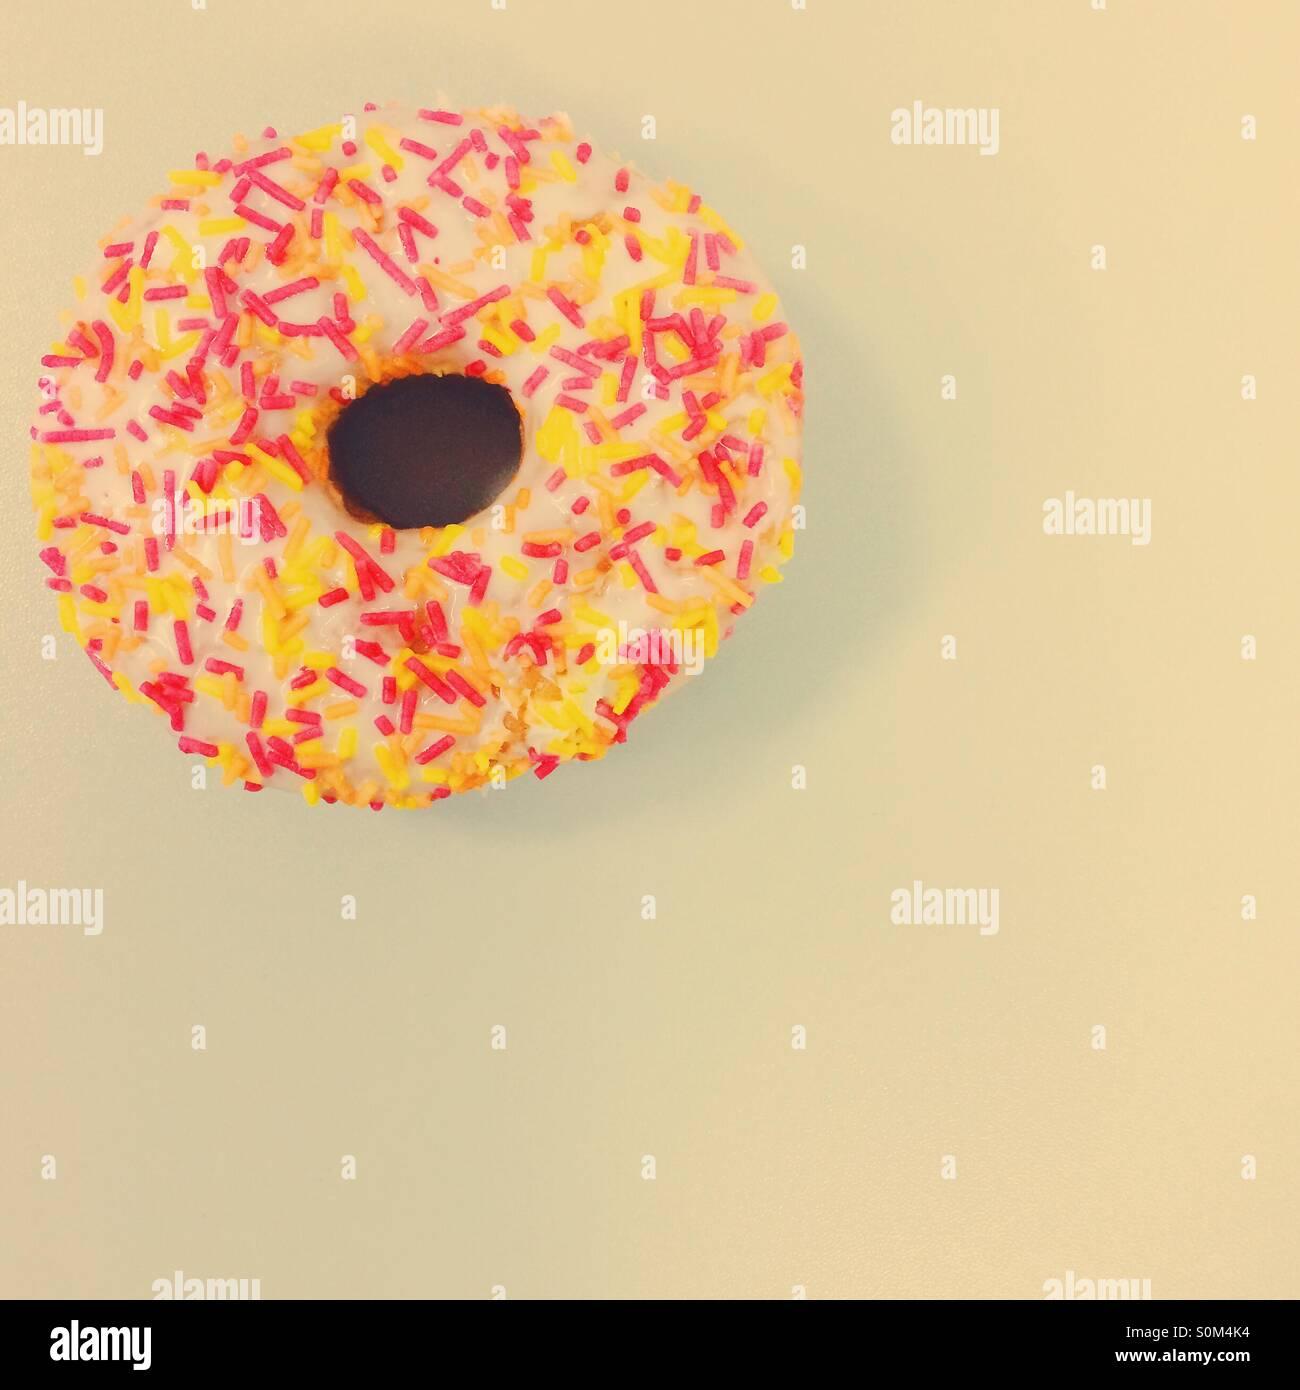 Single ring doughnut with multicoloured sprinkles - Stock Image